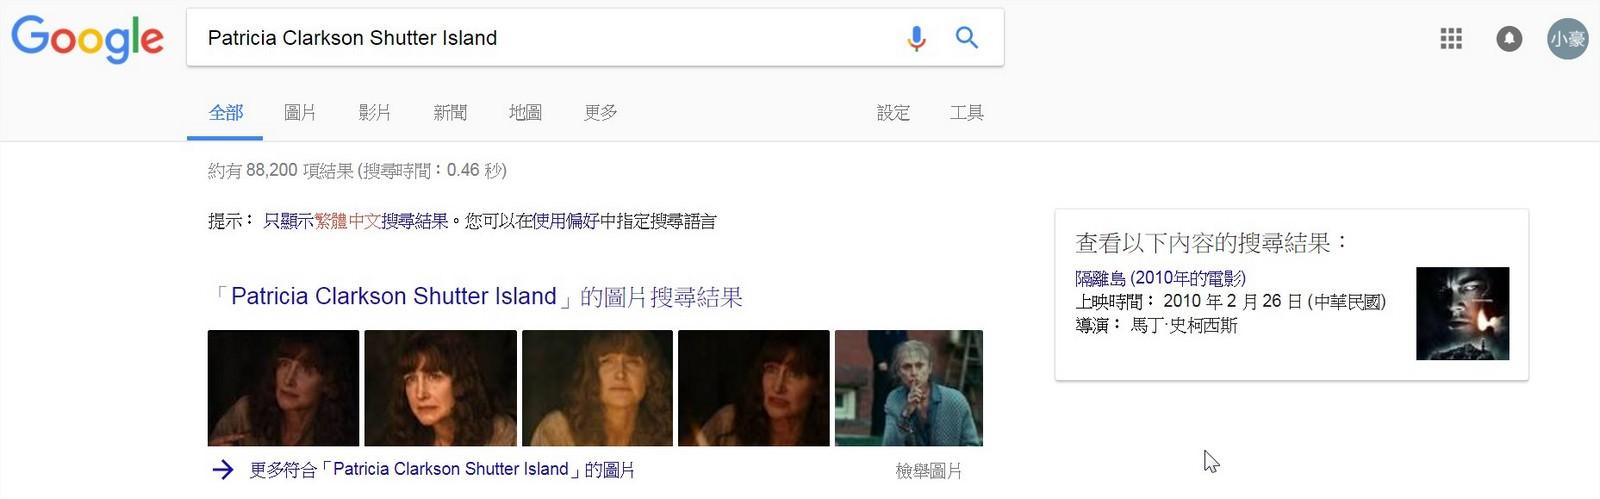 Movie, Shutter Island(美國, 2010年) / 隔離島(台灣) / 不赦島(香港) / 禁闭岛(網路), 資料搜尋, 角色與演員介紹